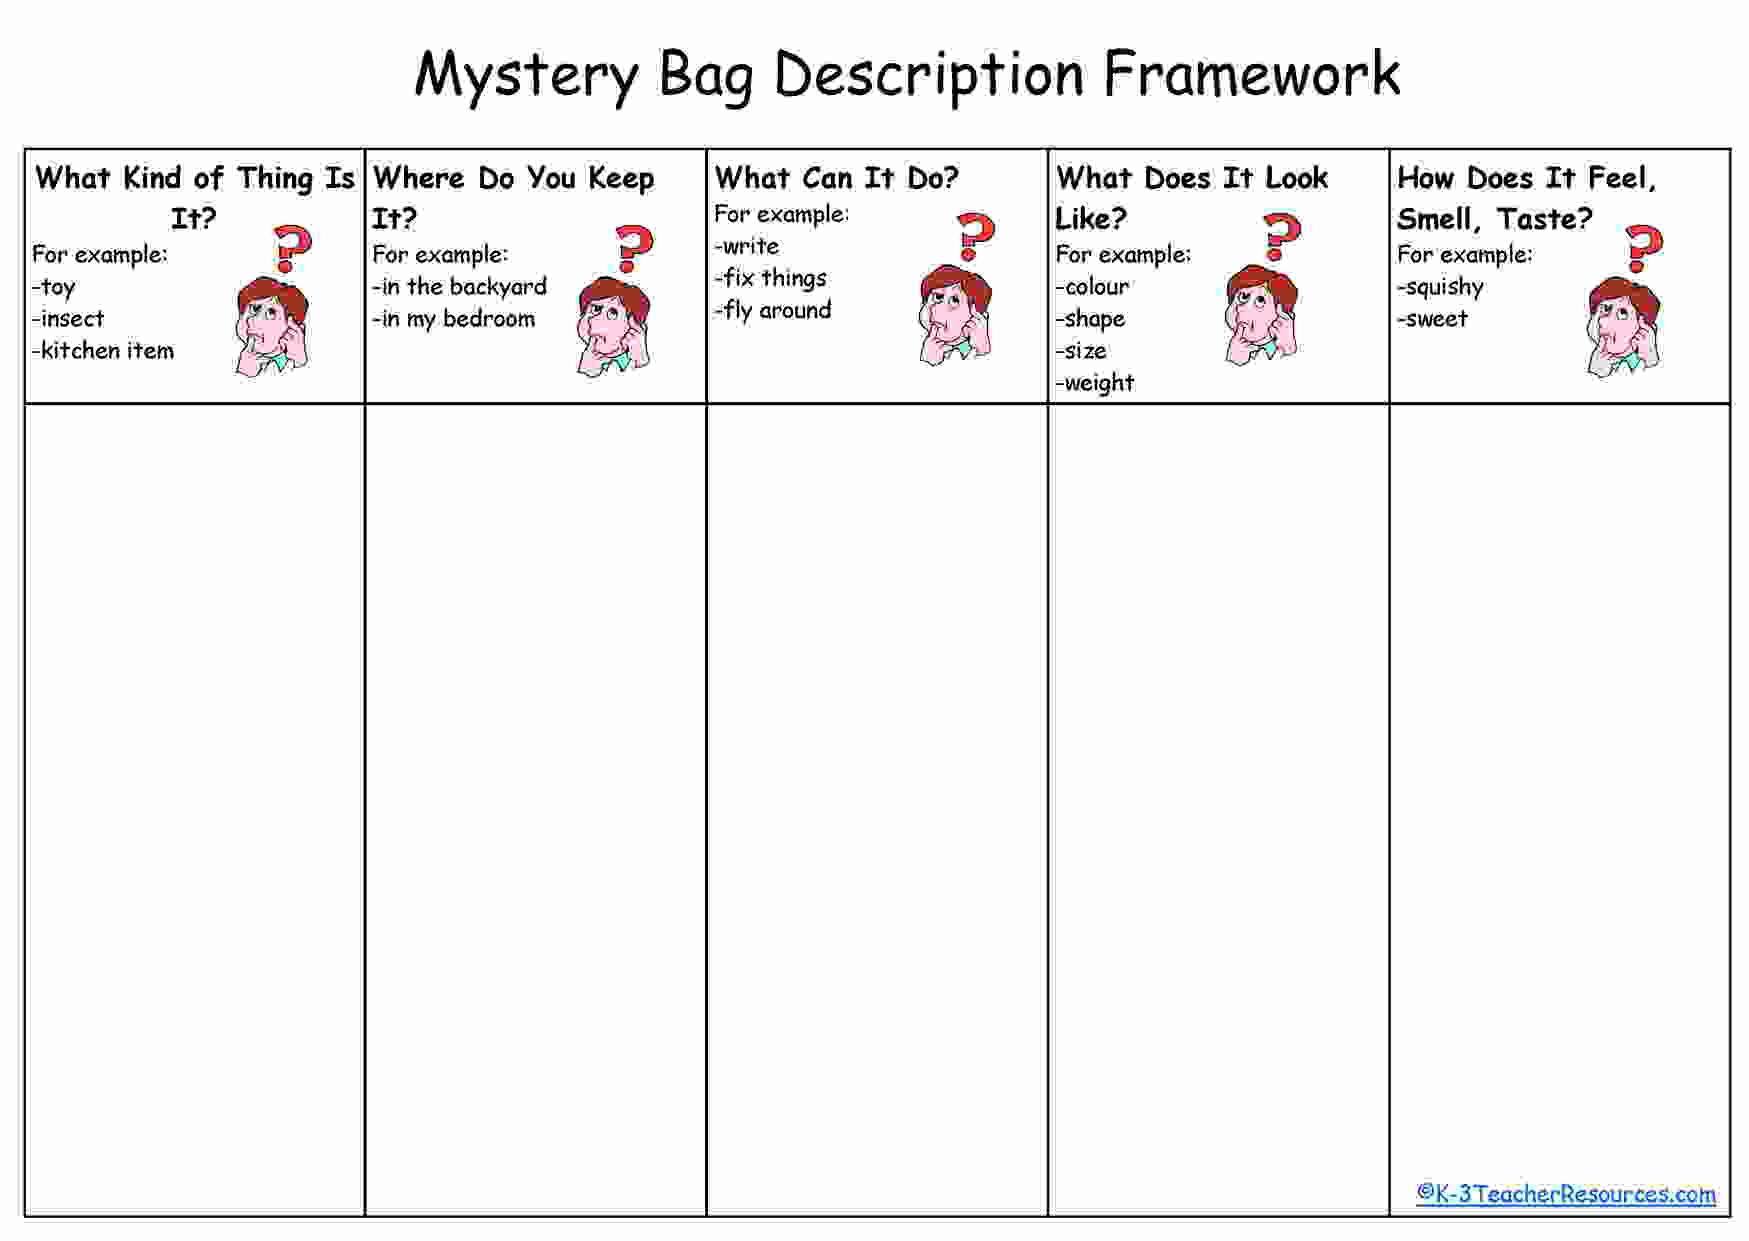 mystery_bag_description_framework